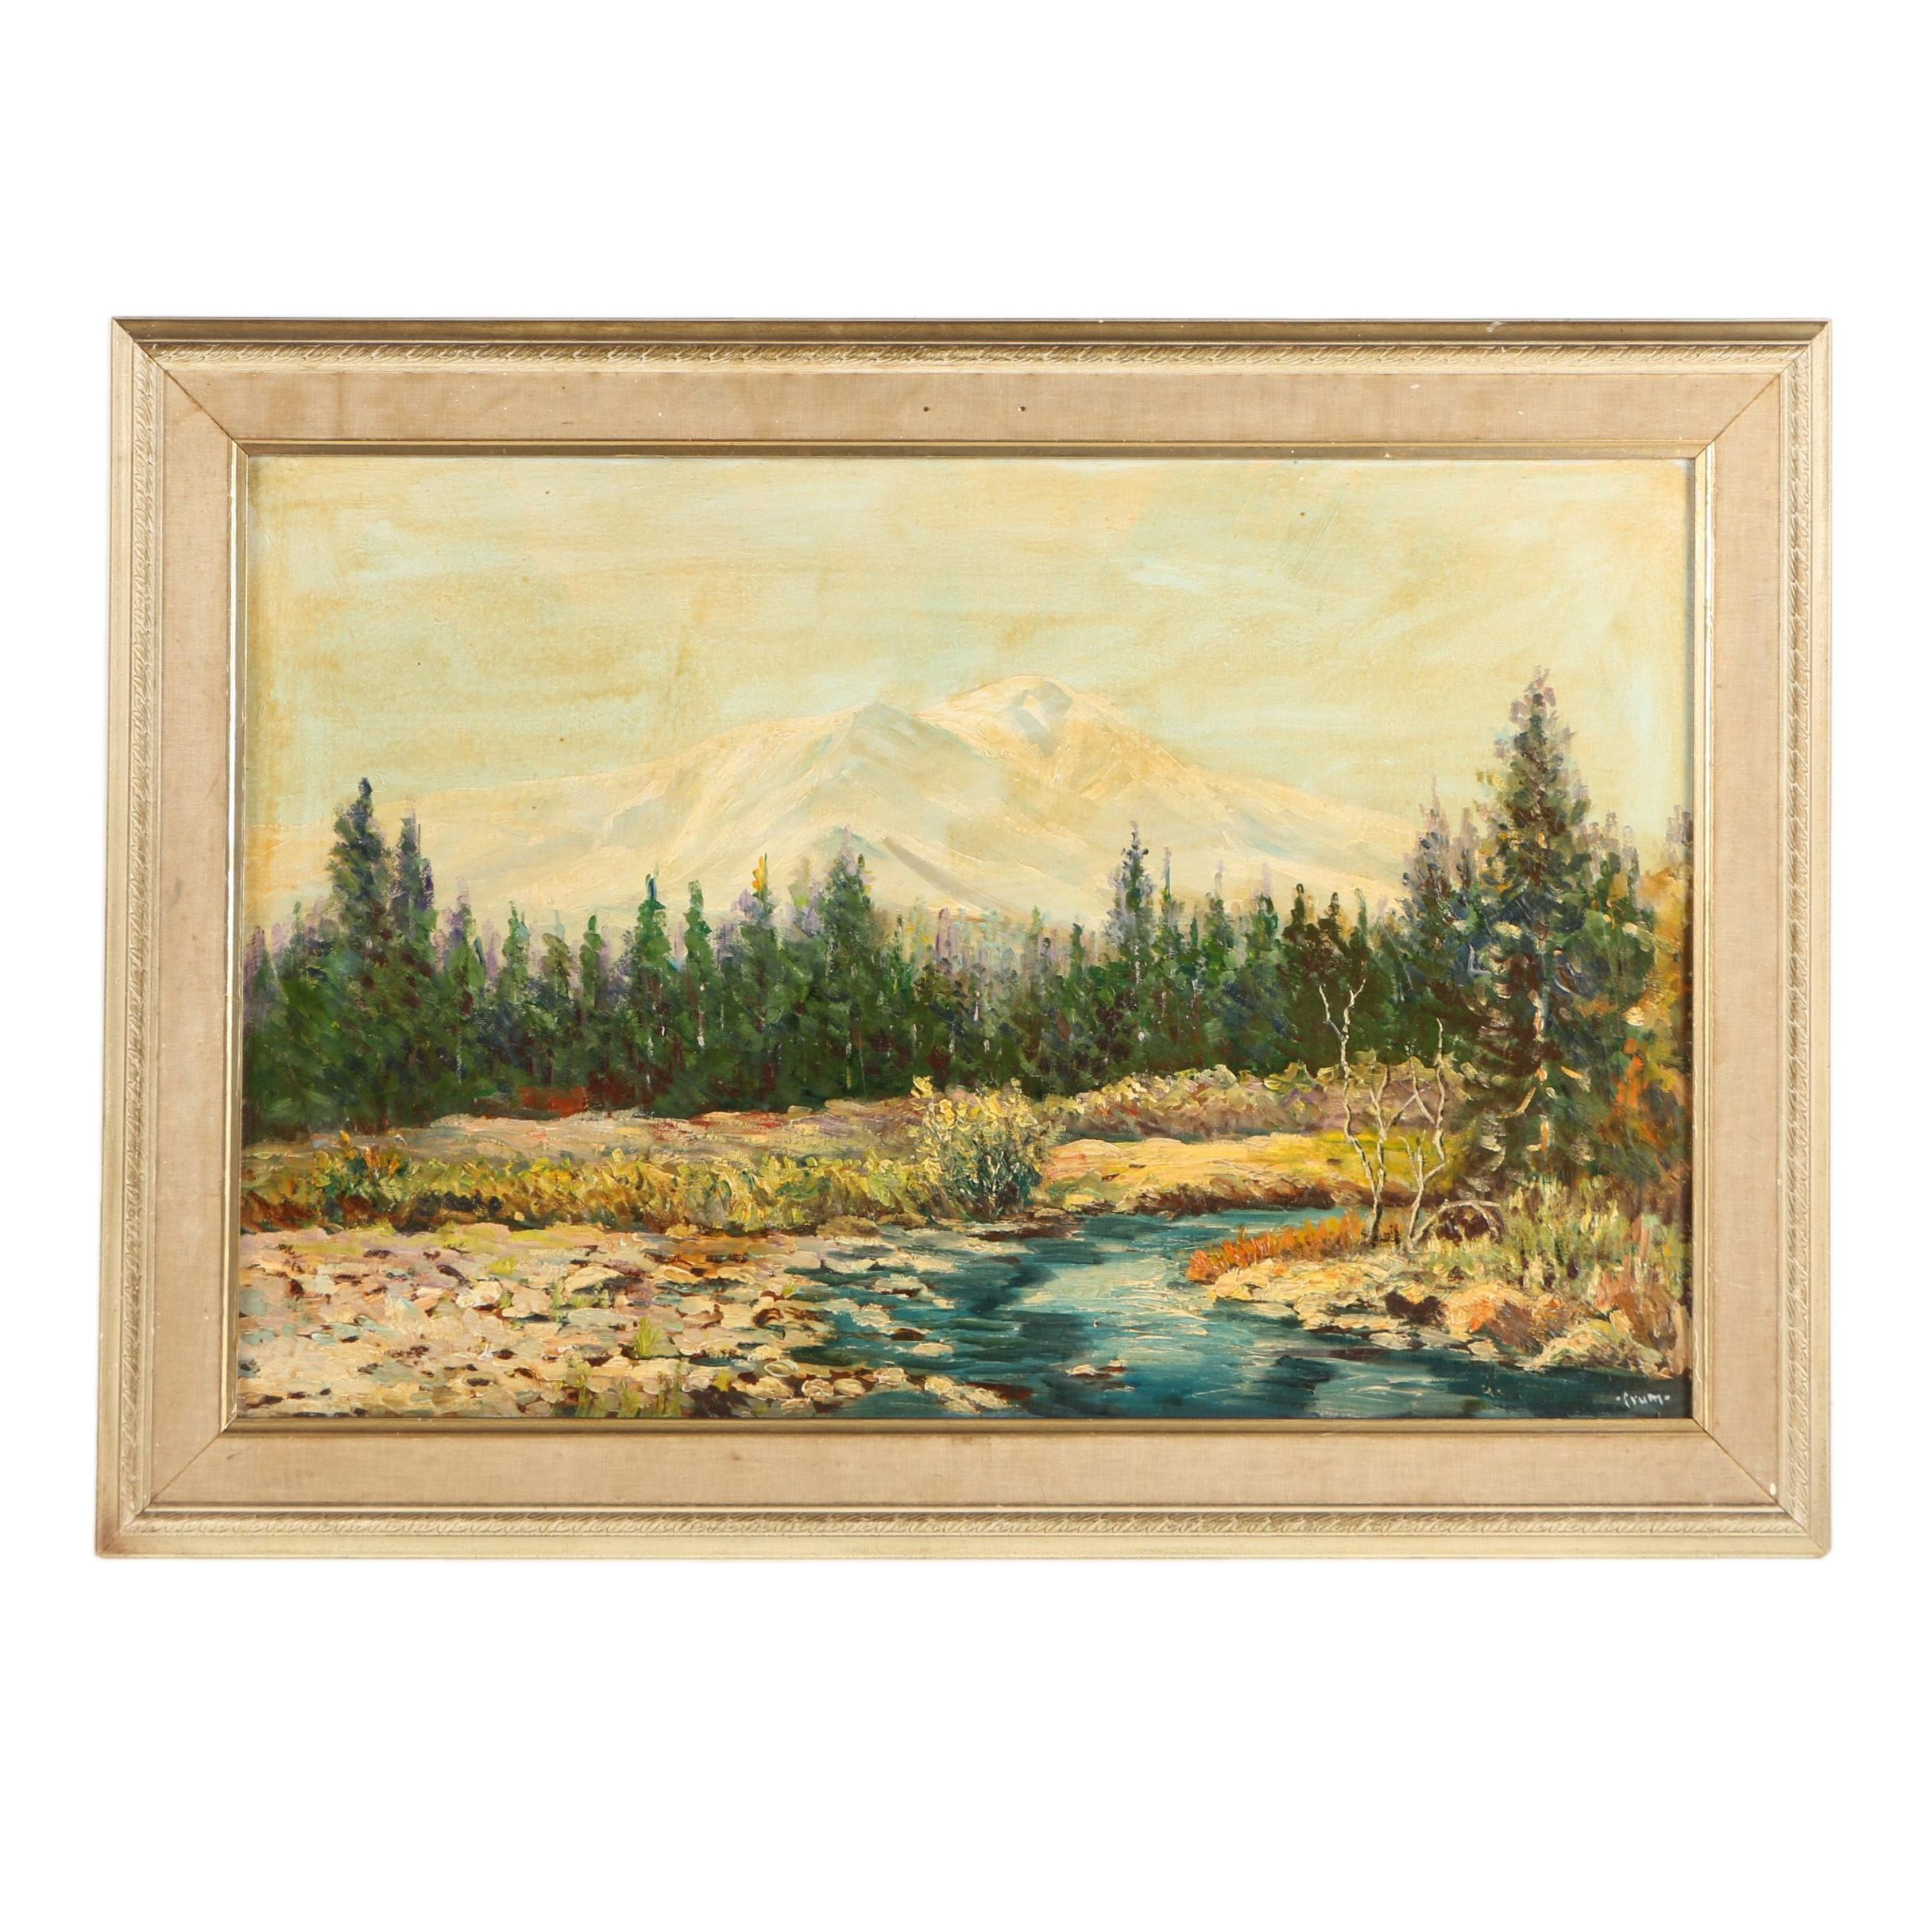 Crum Oil Painting on Masonite Mountainous Landscape